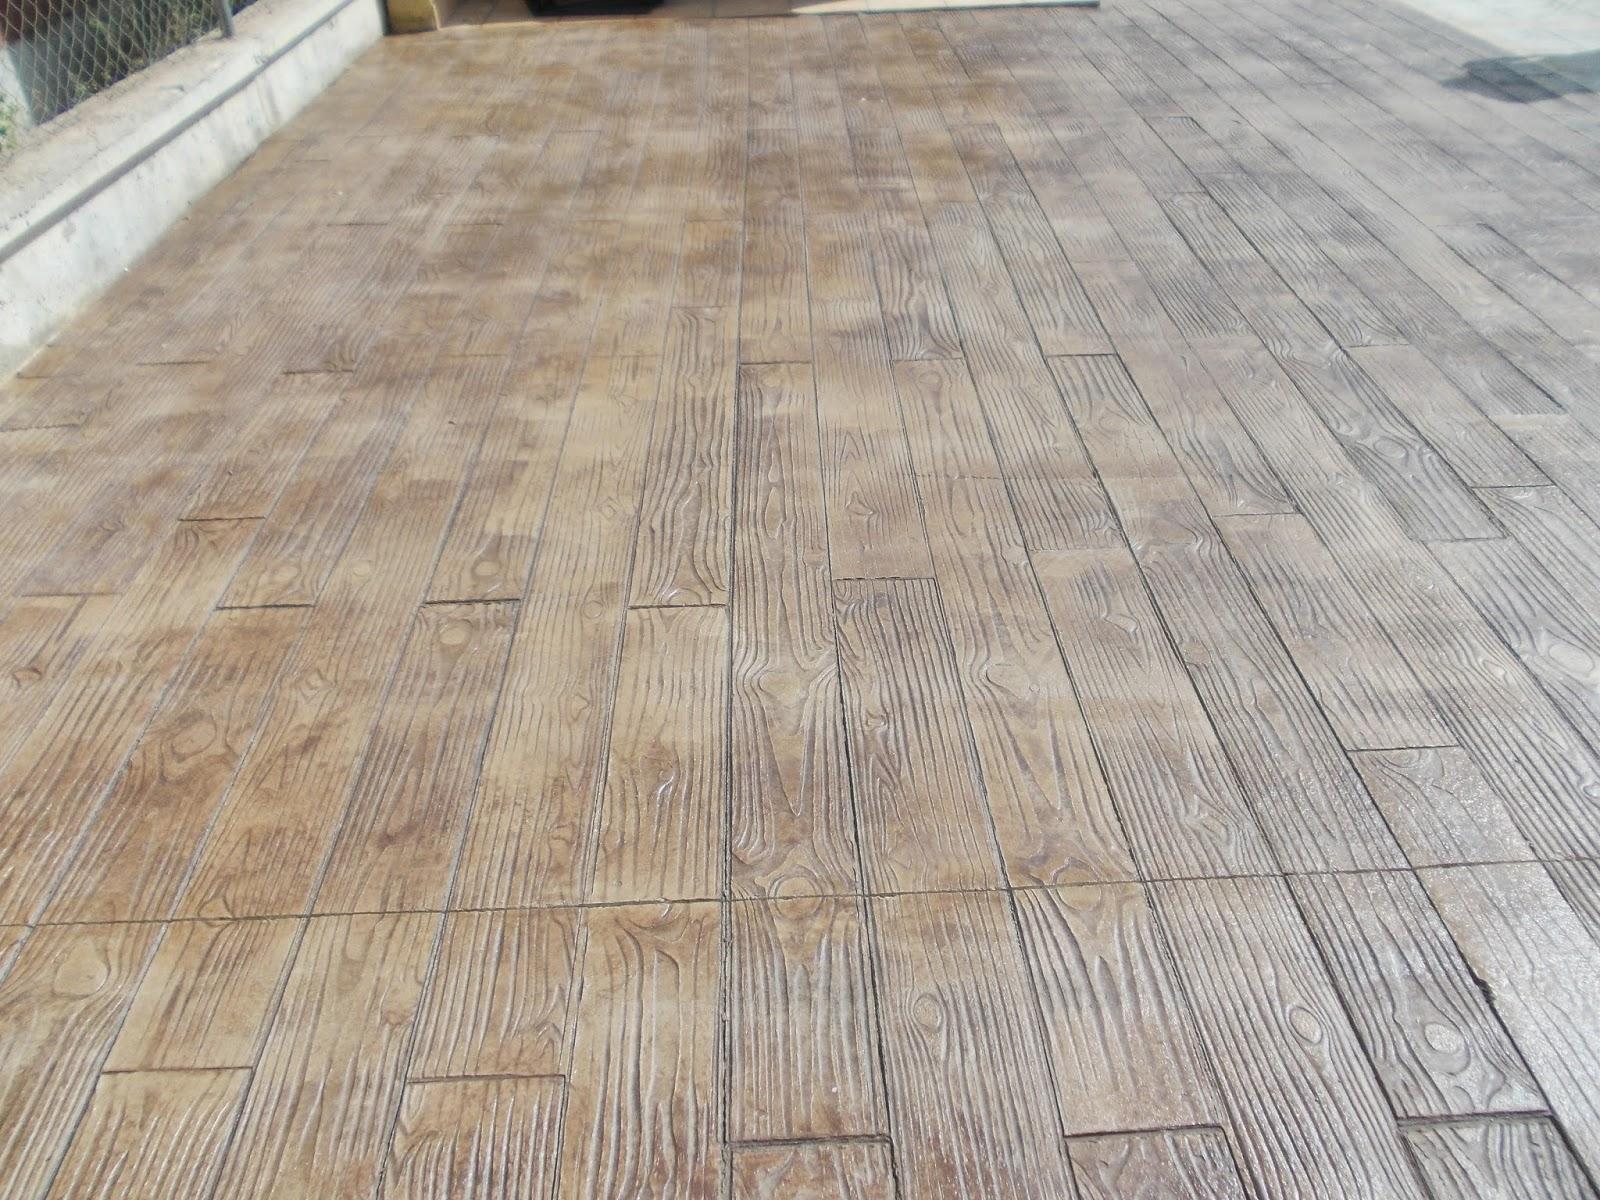 Pavimento continuo de hormig n impreso en murcia for Pavimento de hormigon barcelona